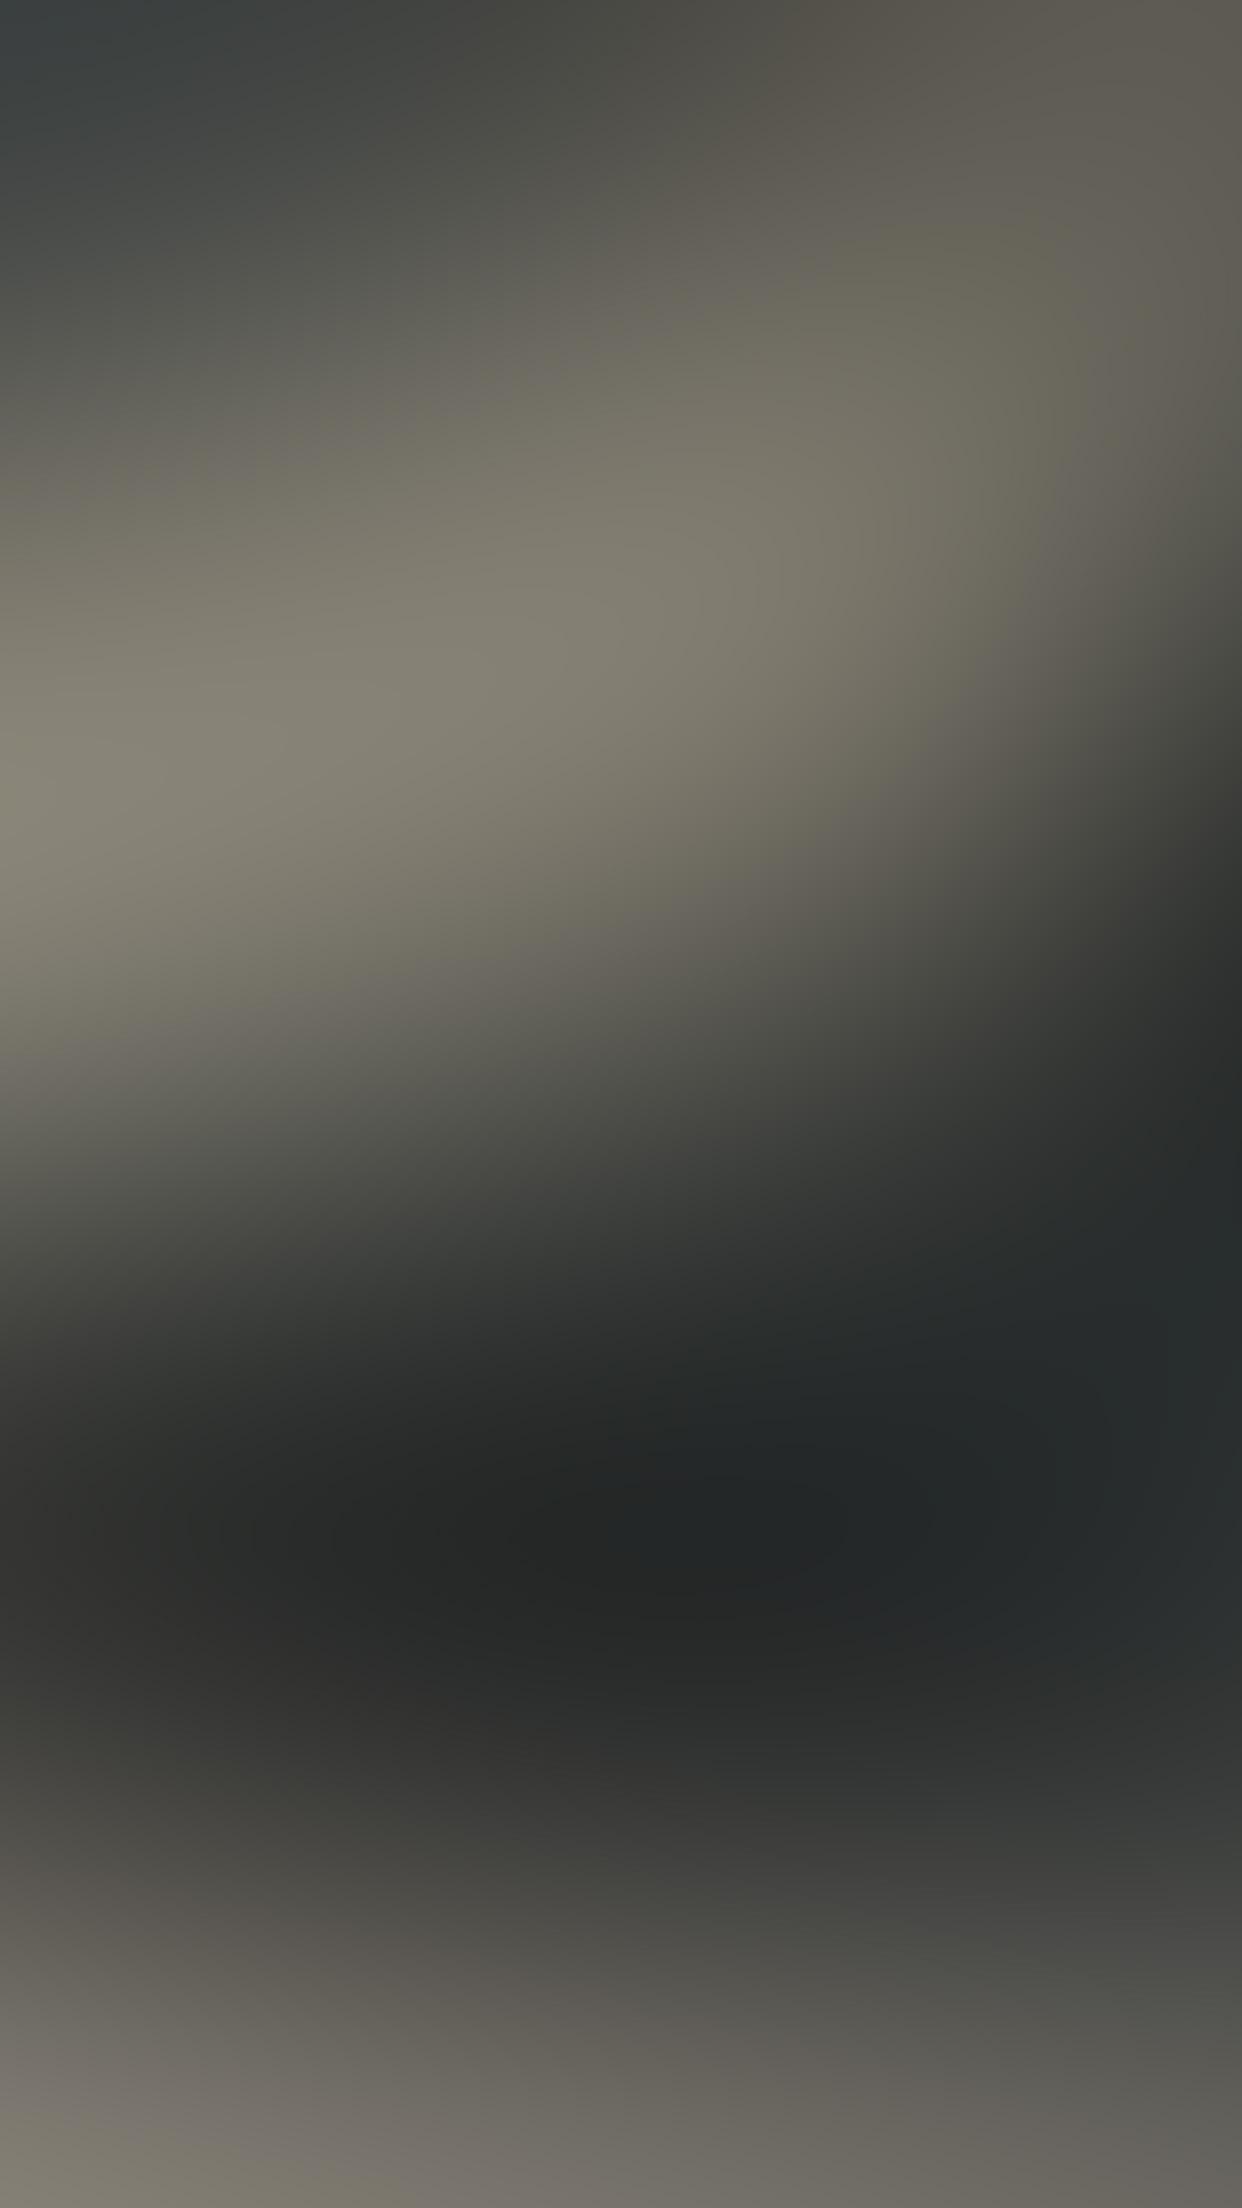 Iphone7papers Com Iphone7 Wallpaper Sj61 Gray Dark Gradation Blur